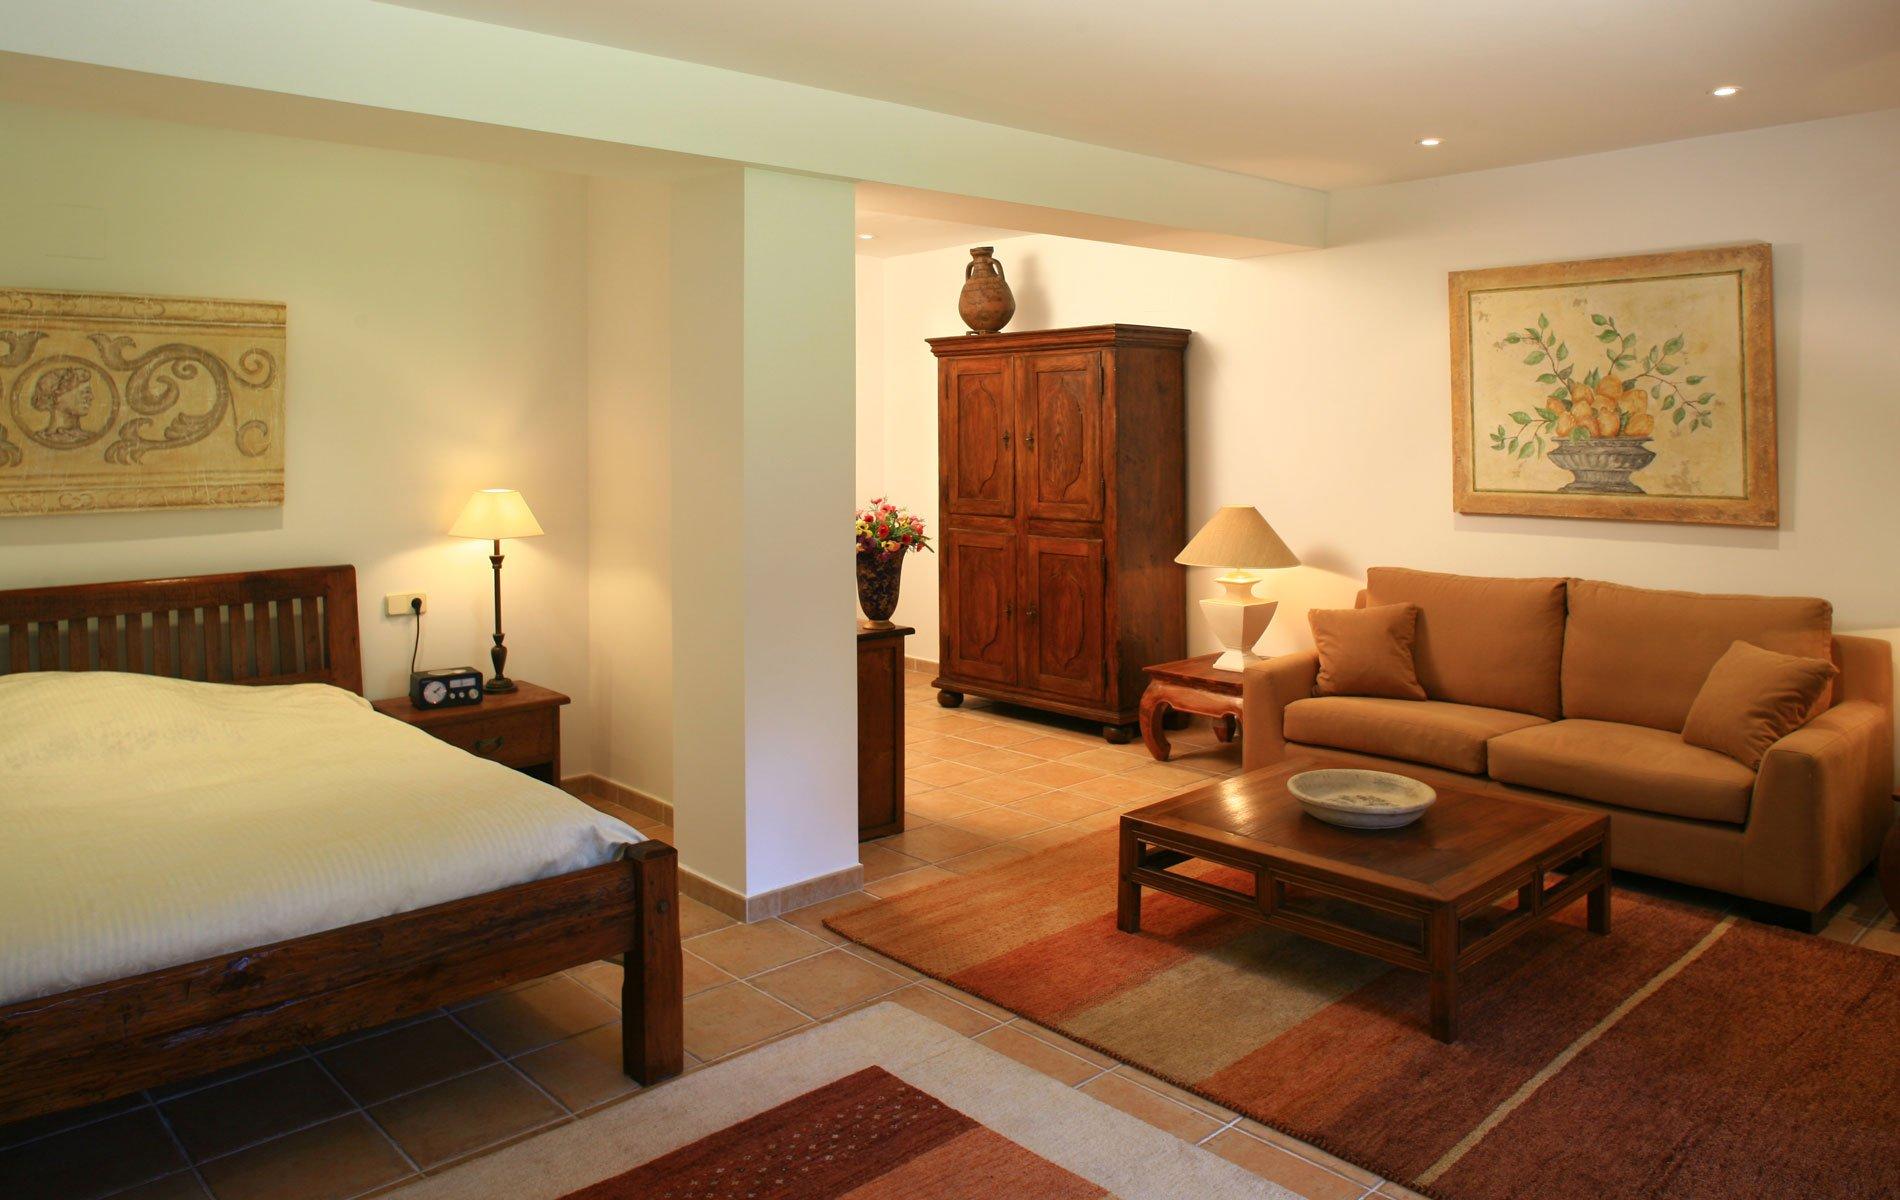 Villa tradicional en una zona tranquila